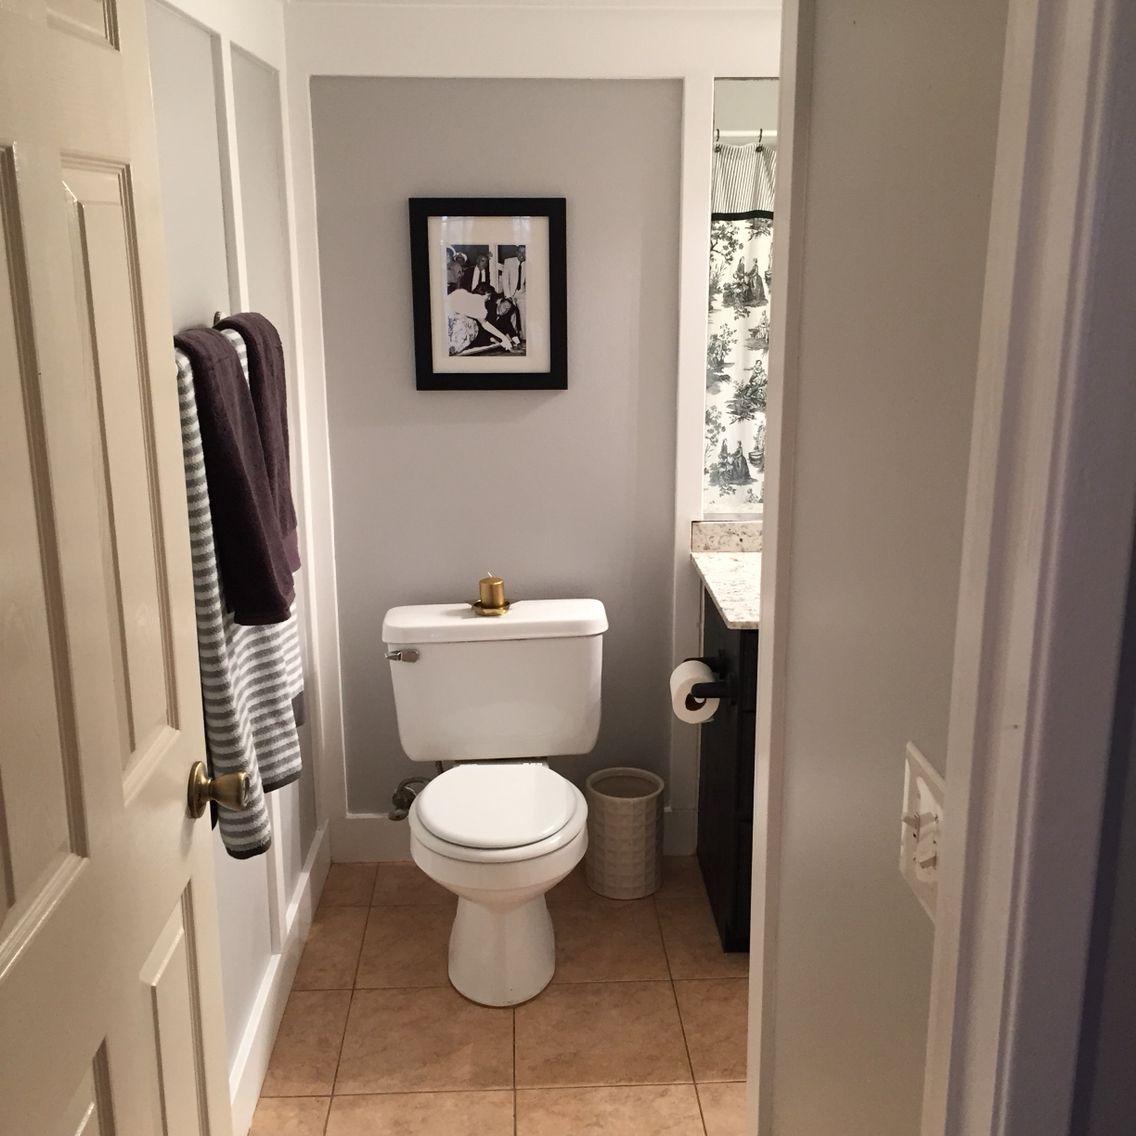 Bathroom Lighting No Window gray/white/black bathroom entry mixed metal touches help a